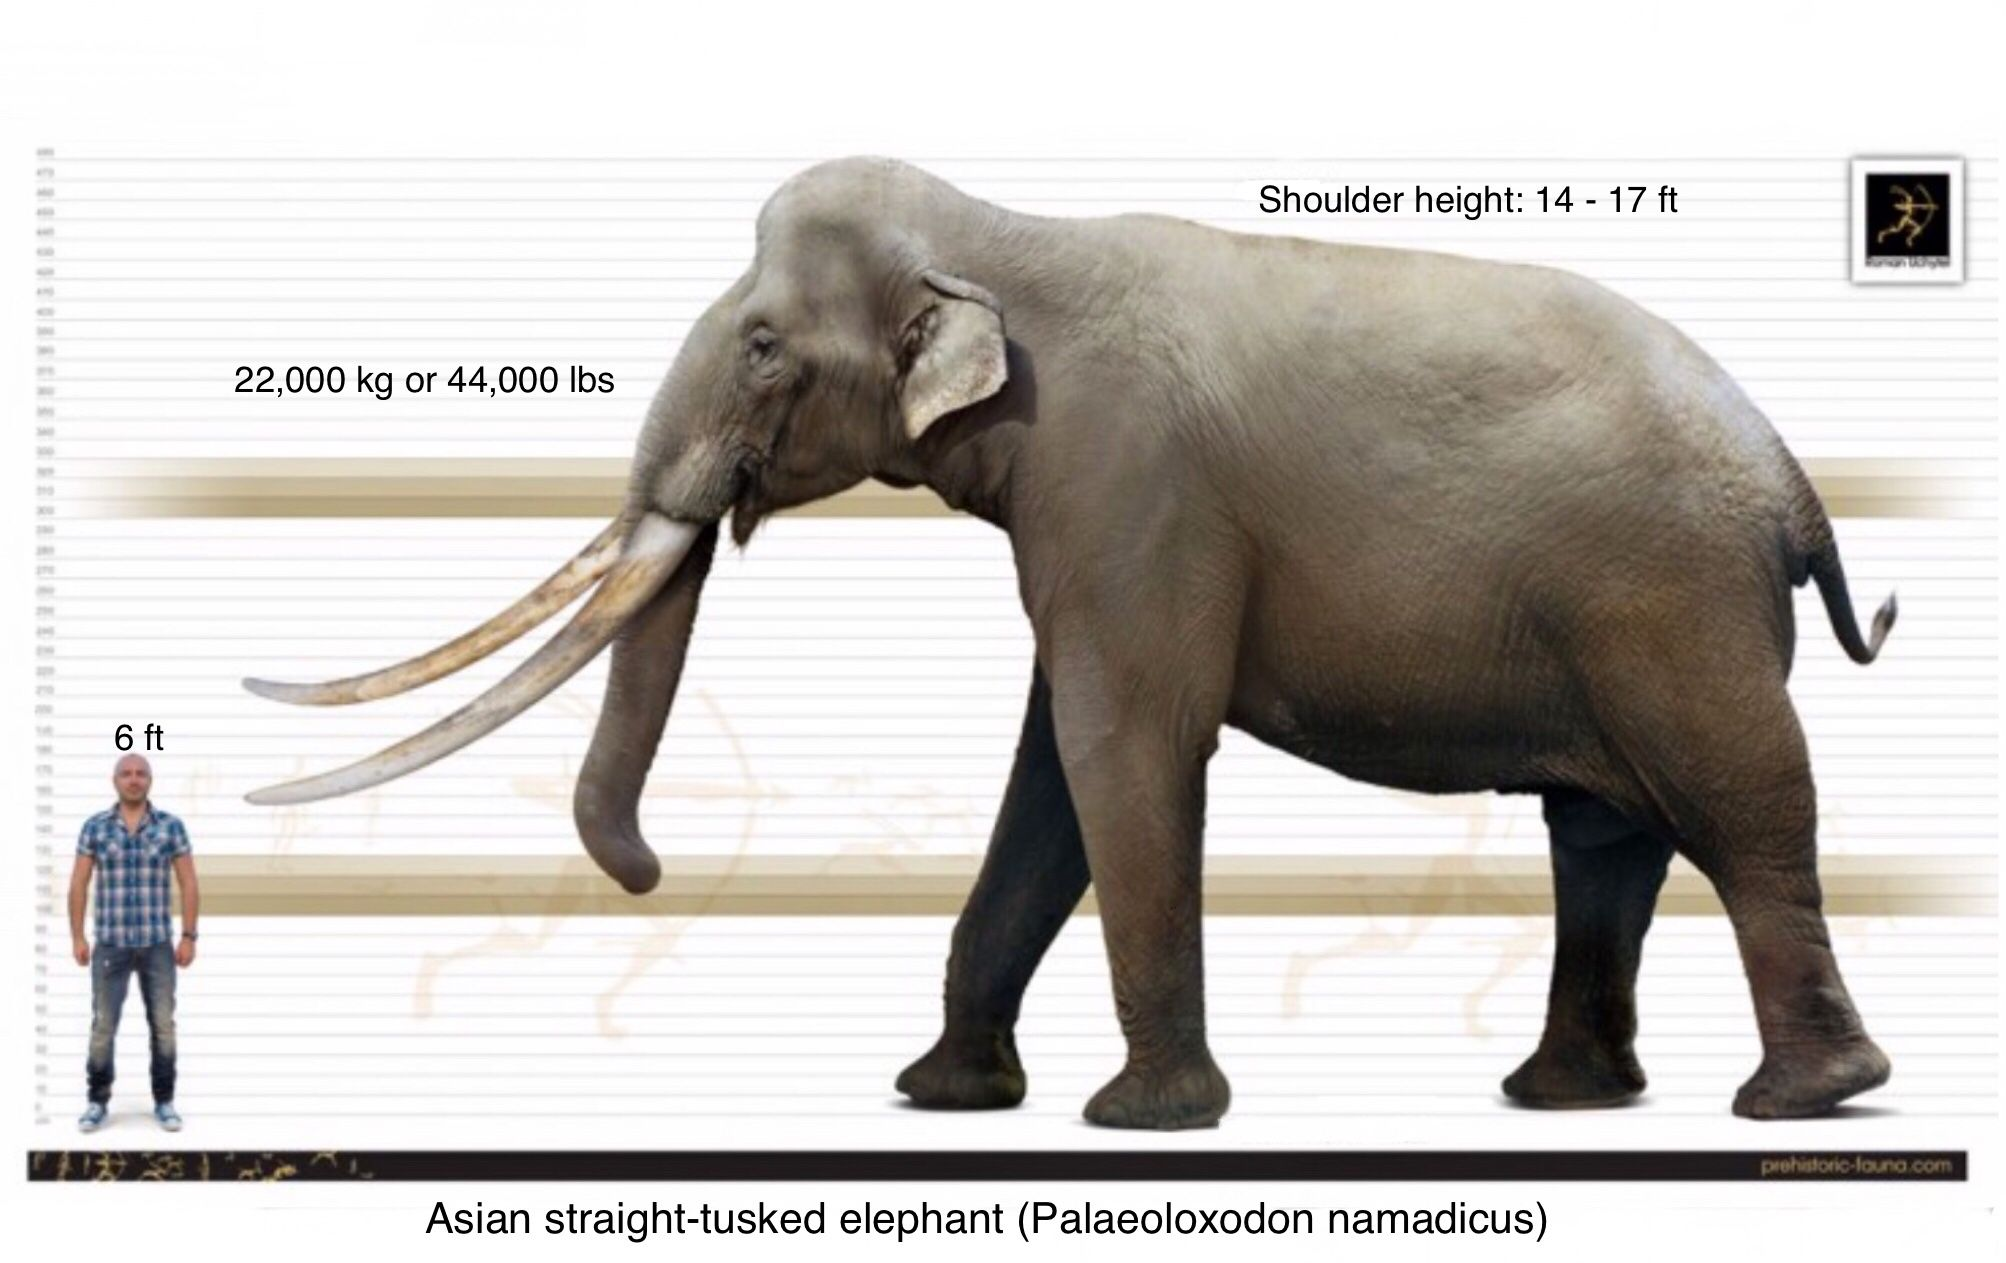 Palaeoloxodon namadicus is a prehistoric straight-tusked elephant that ranged through Pleistocene Asia, fro… | Prehistoric animals, Extinct animals, Ancient animals